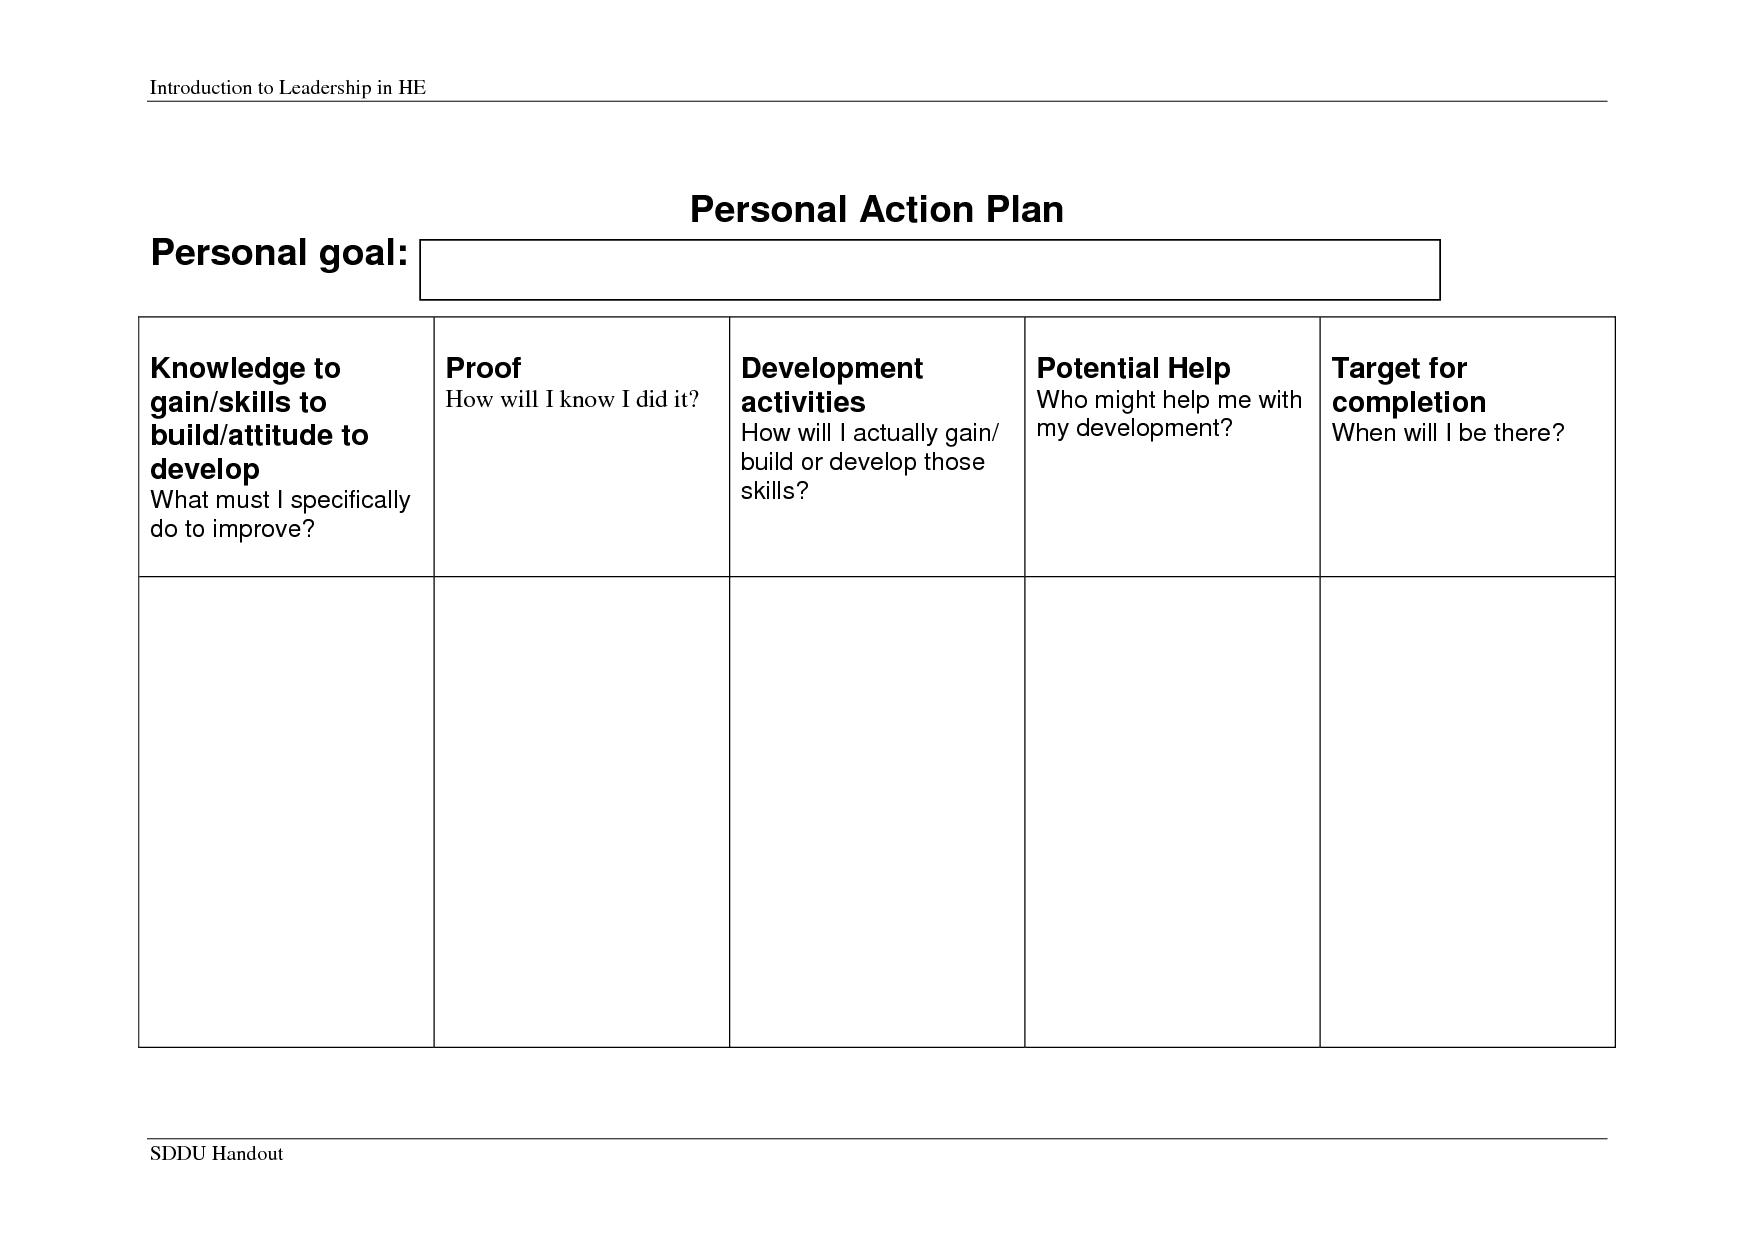 006 Personal Development Action Plan Template 31178 Ulyssesroom